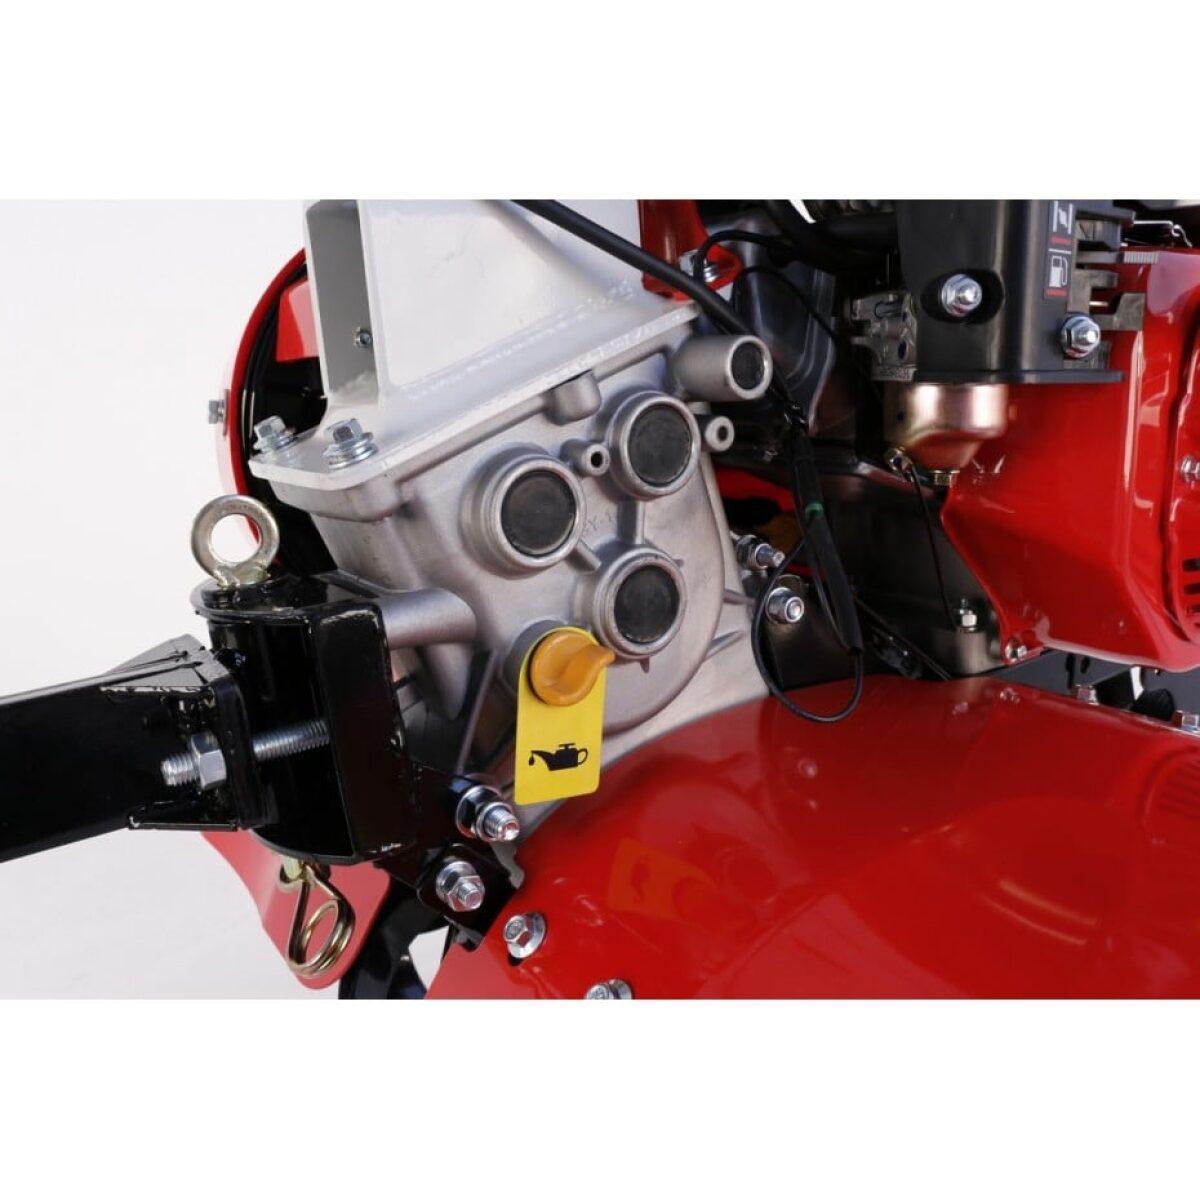 motocultor loncin lc750 7cp o mac.ro 7 82